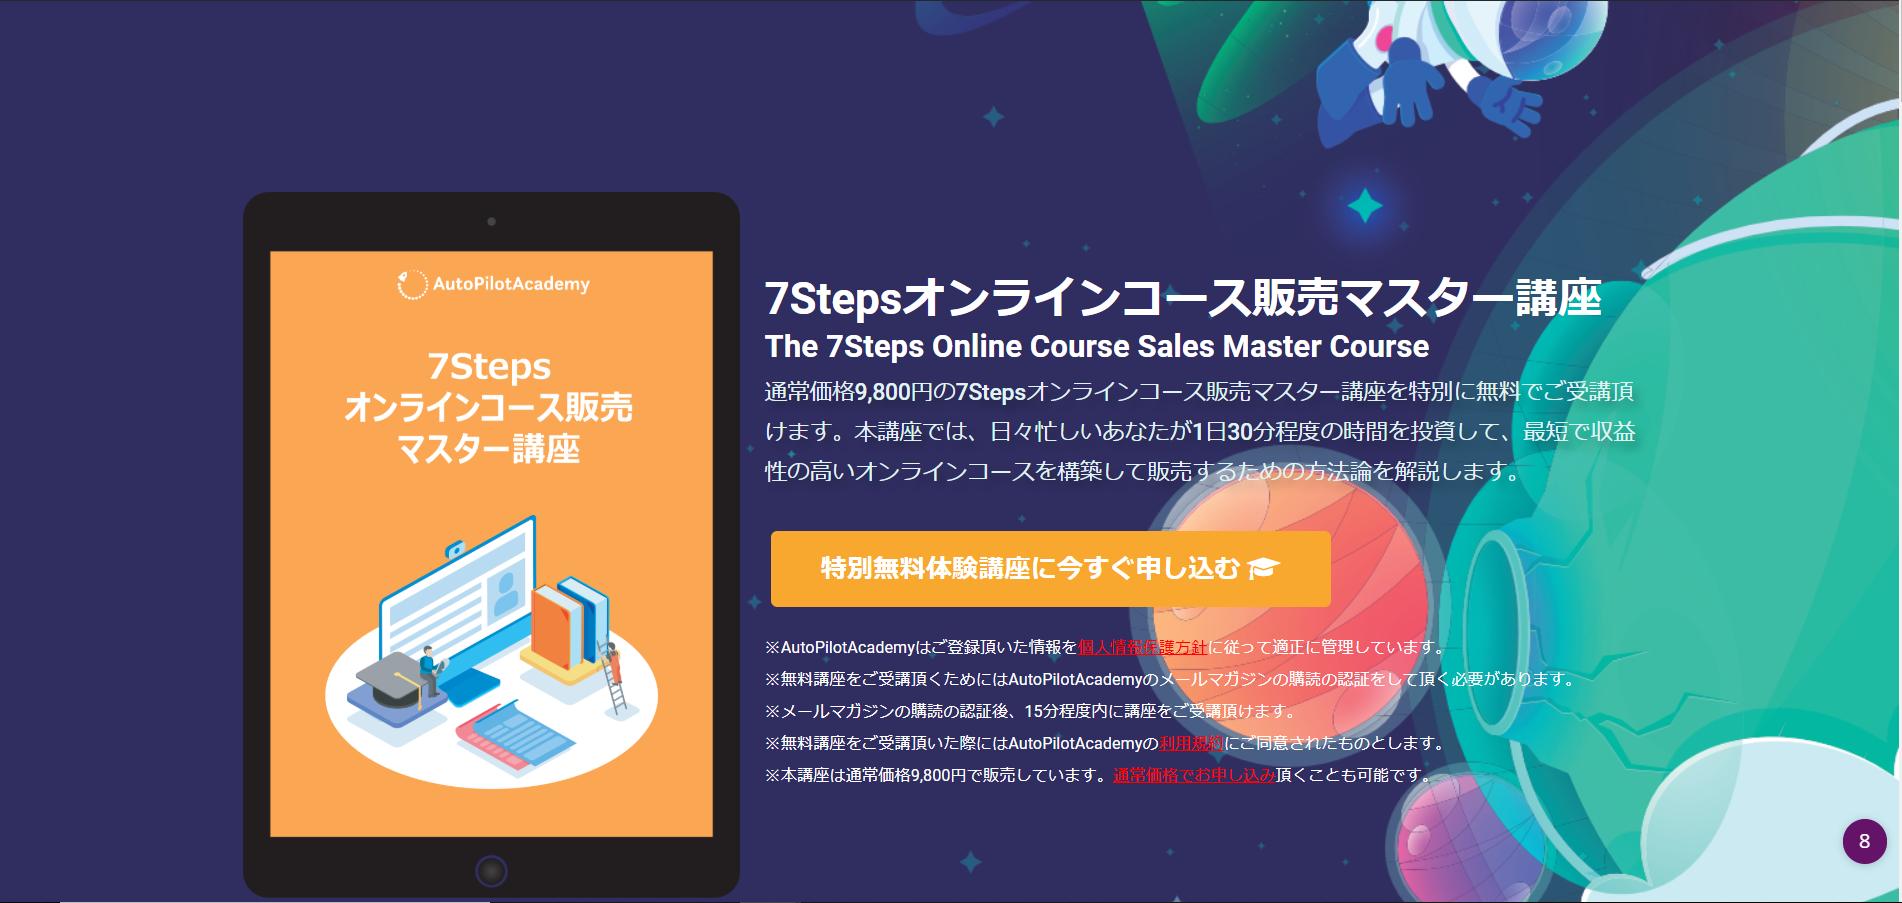 7Stepsオンラインコース販売マスター講座